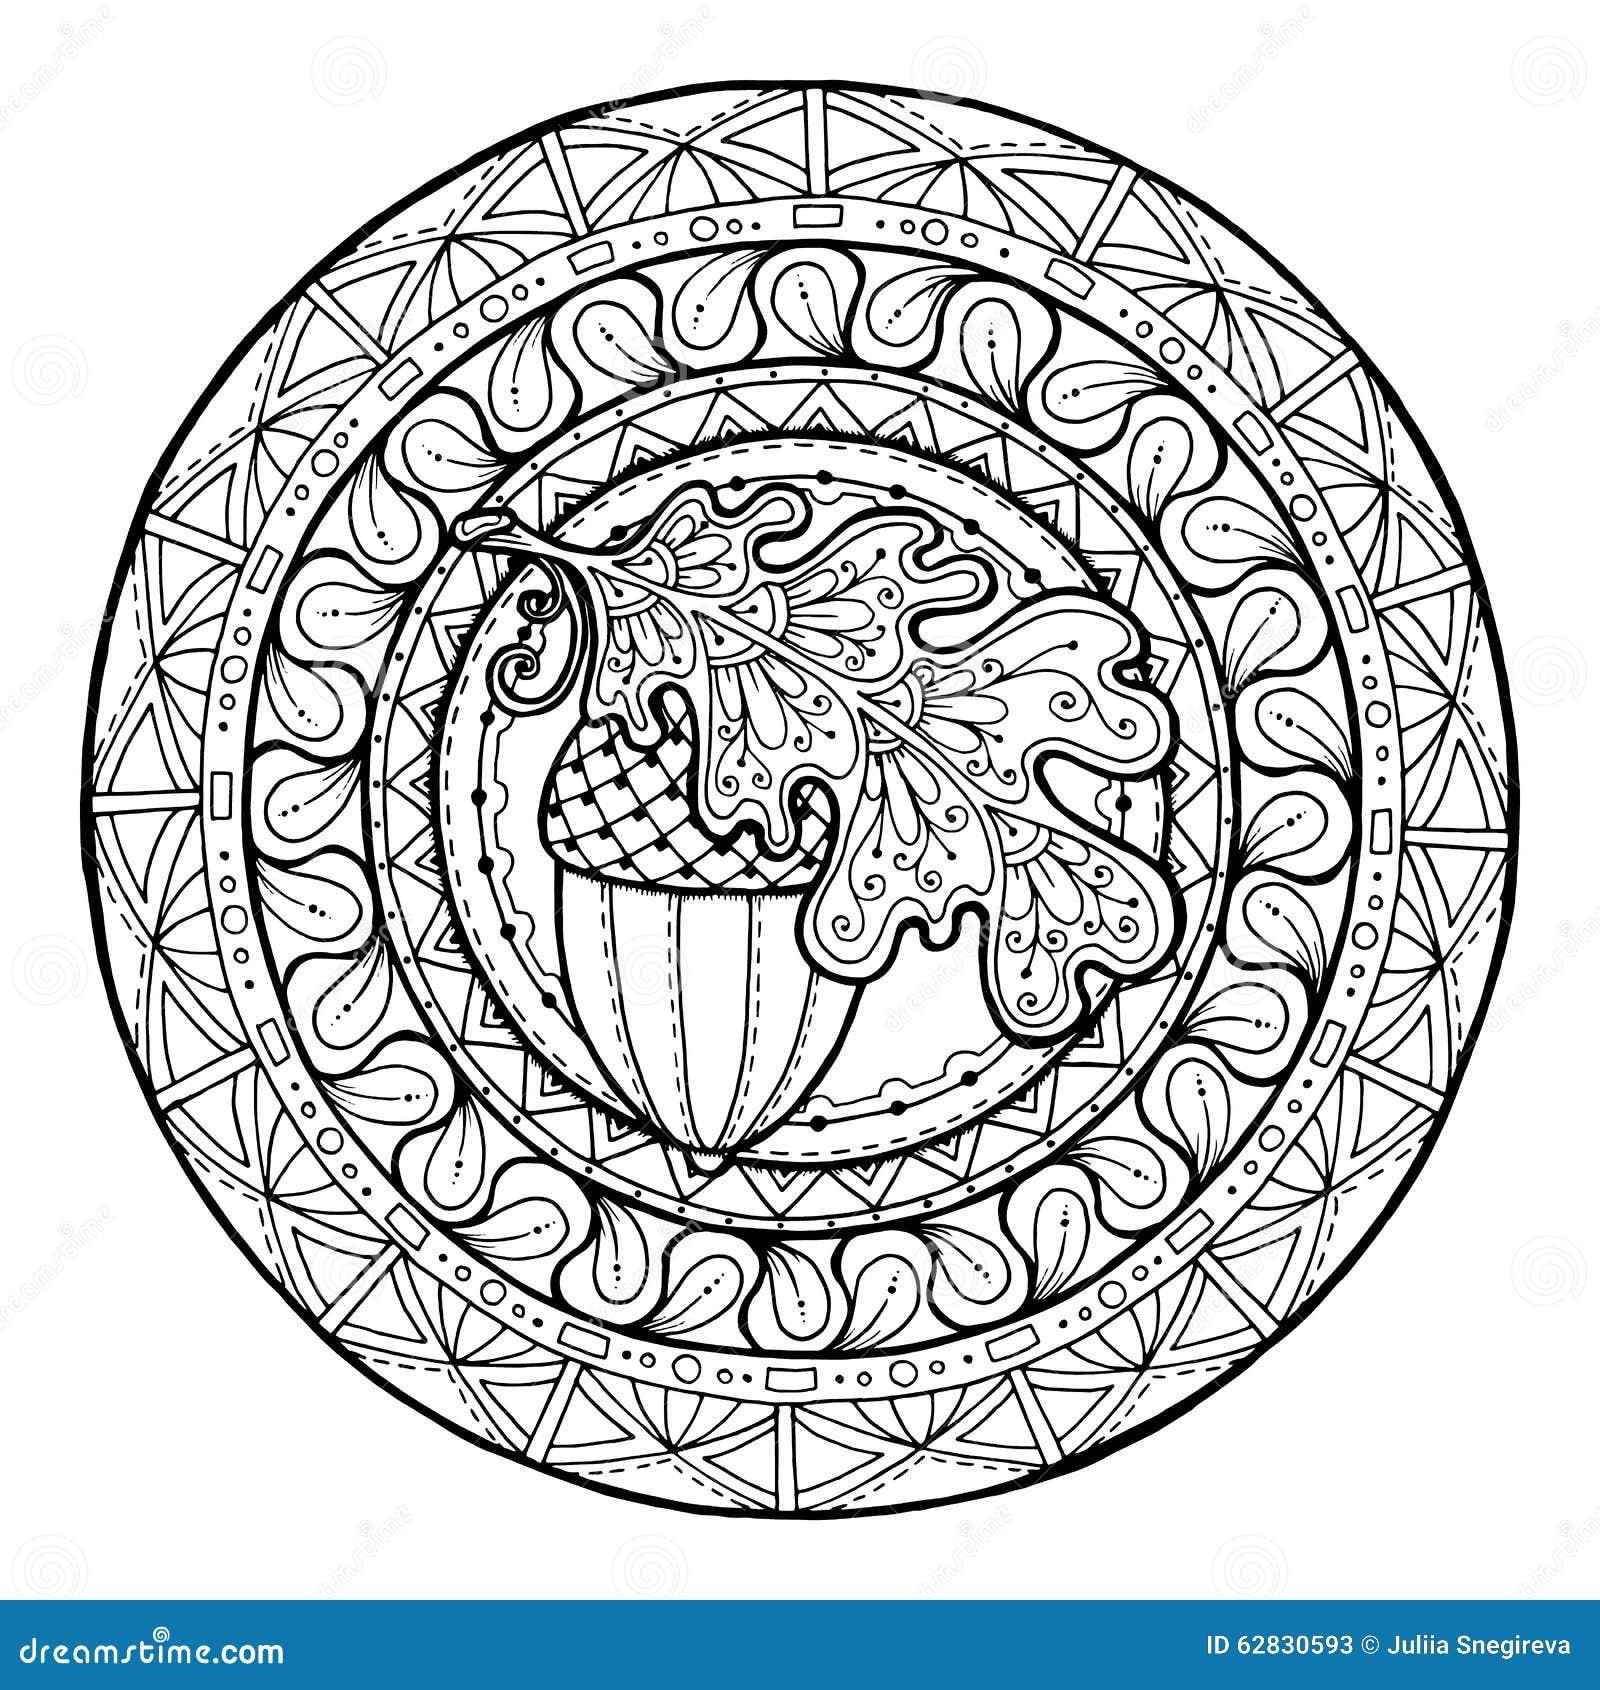 Mandala autumn oak leaf ornament stock vector for Fall mandala coloring pages